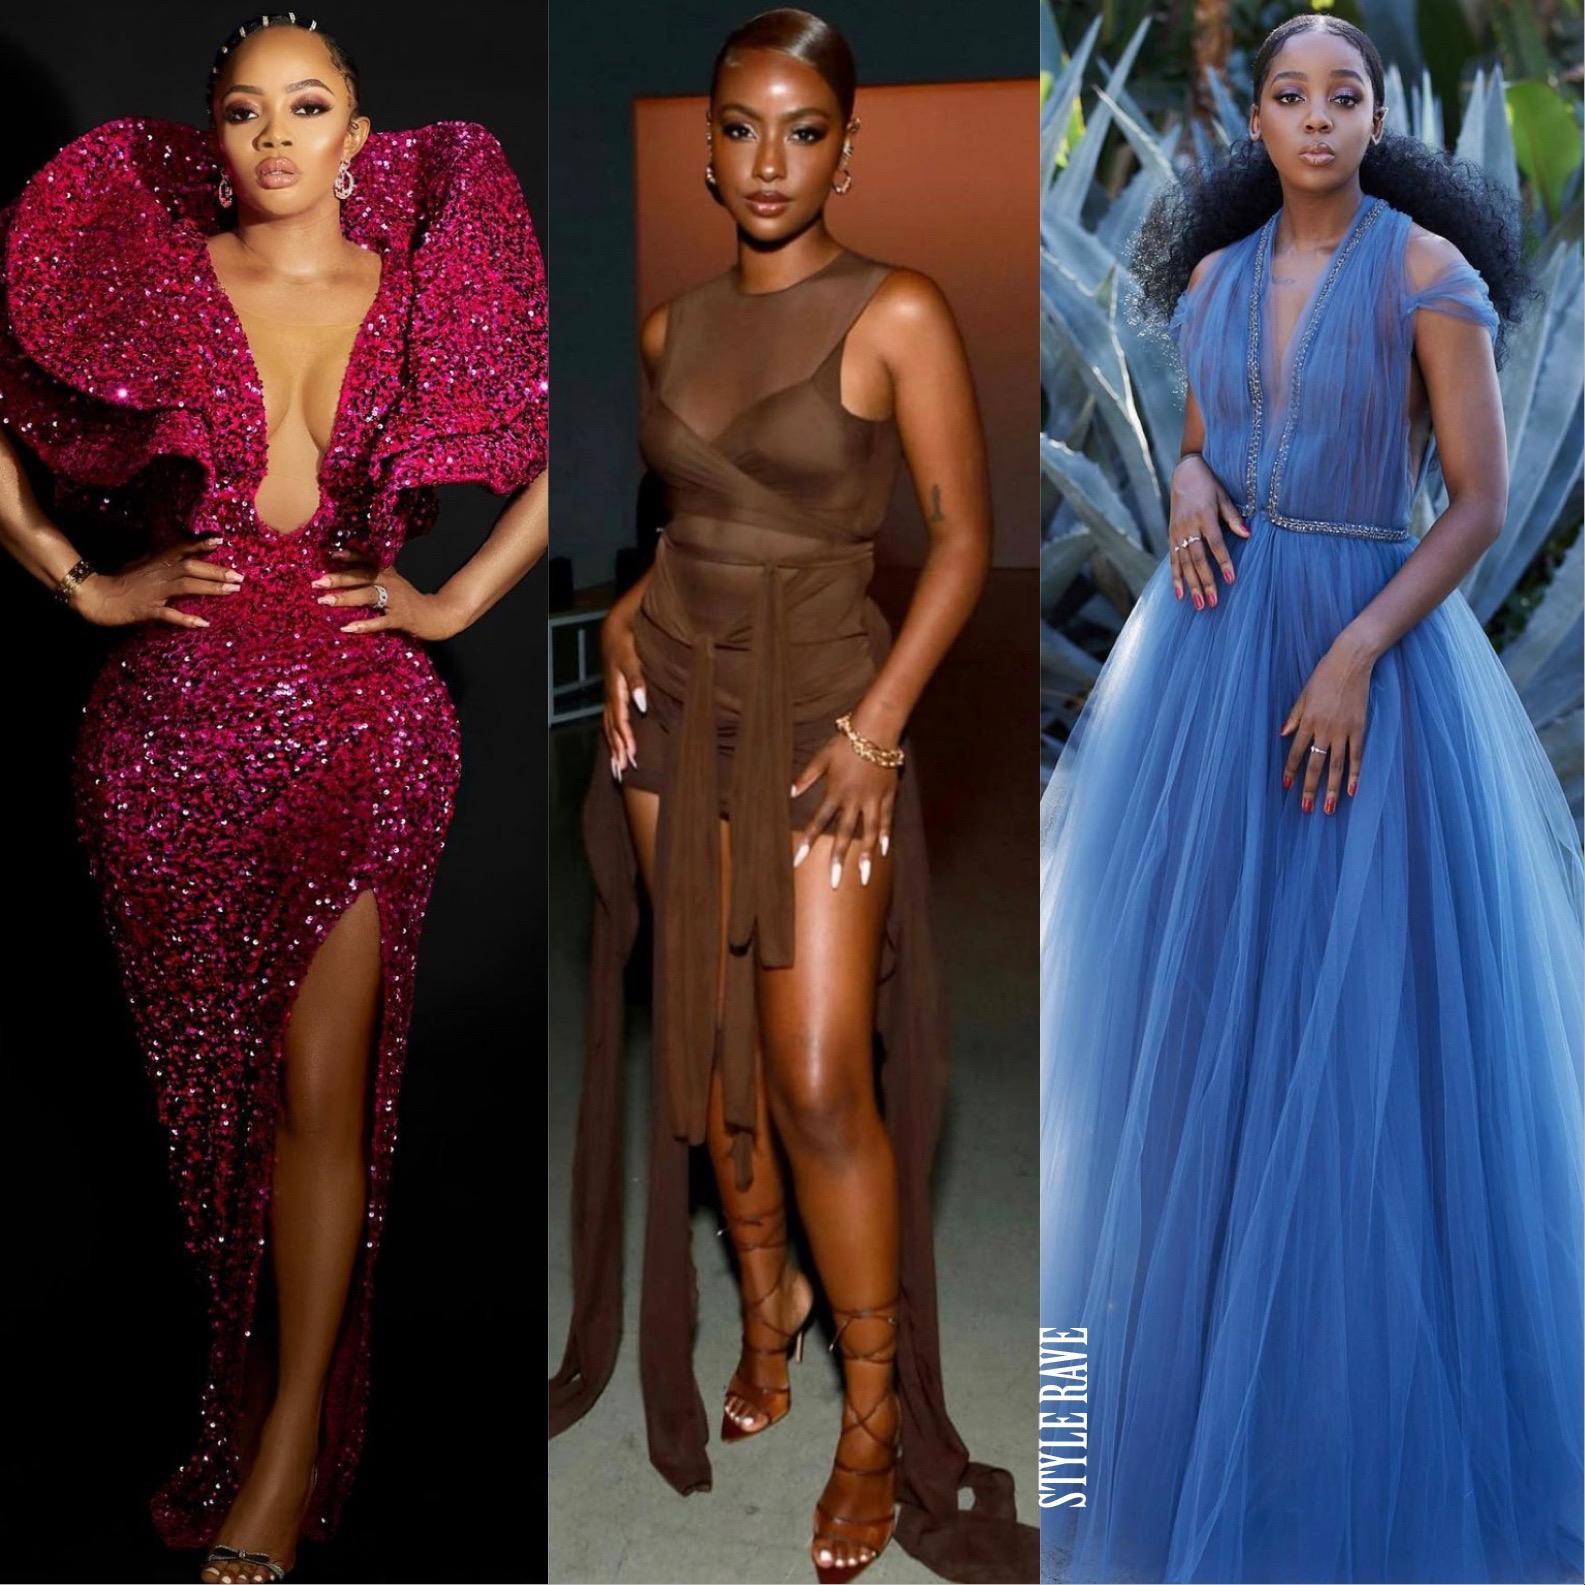 beautiful-black-women-pose-in-ball-dresses